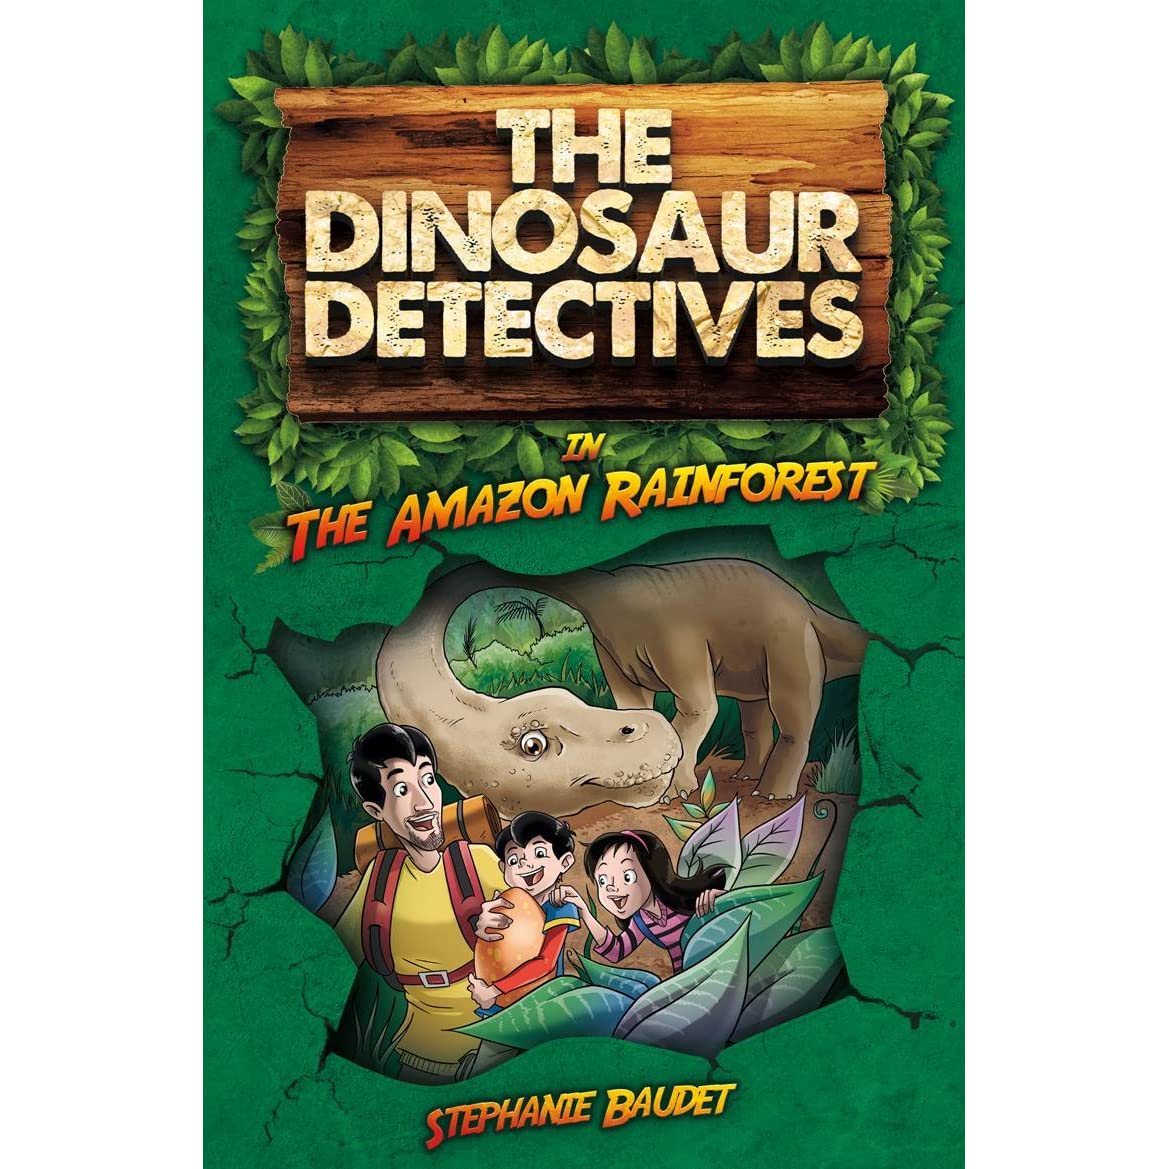 the dinosaur detectives in the amazon rainforest by stephanie baudet